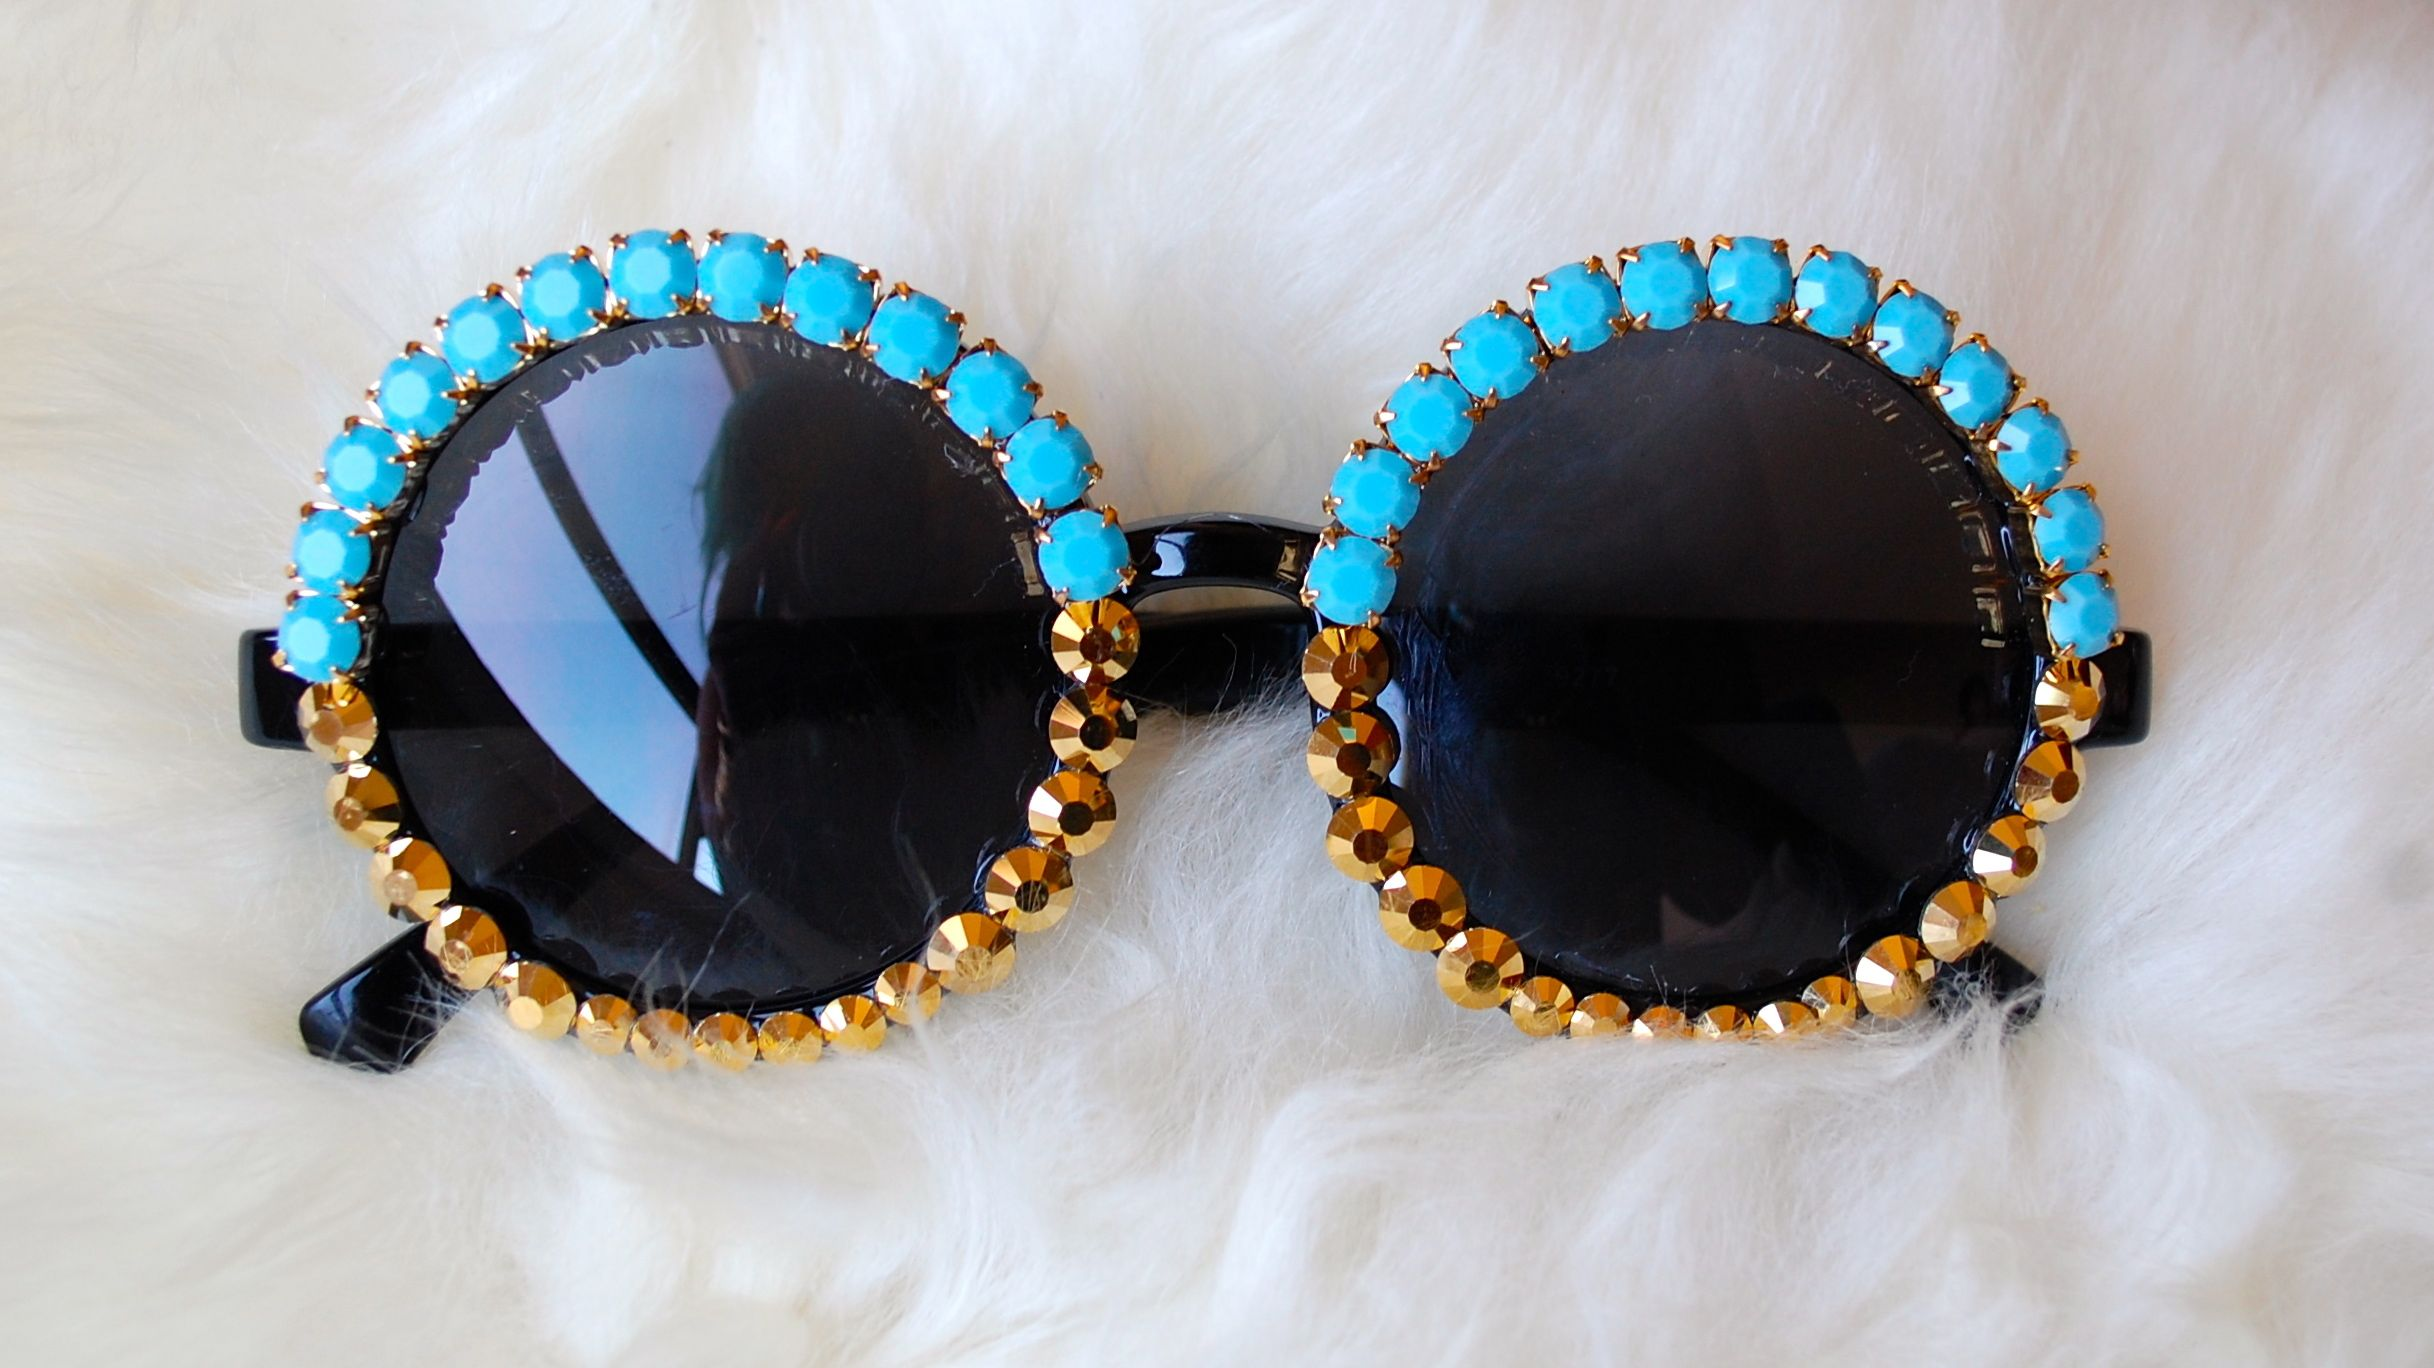 Pin de Elif Şişli Cengiz en sunglasses | Pinterest | Lentes, Gafas y Sol